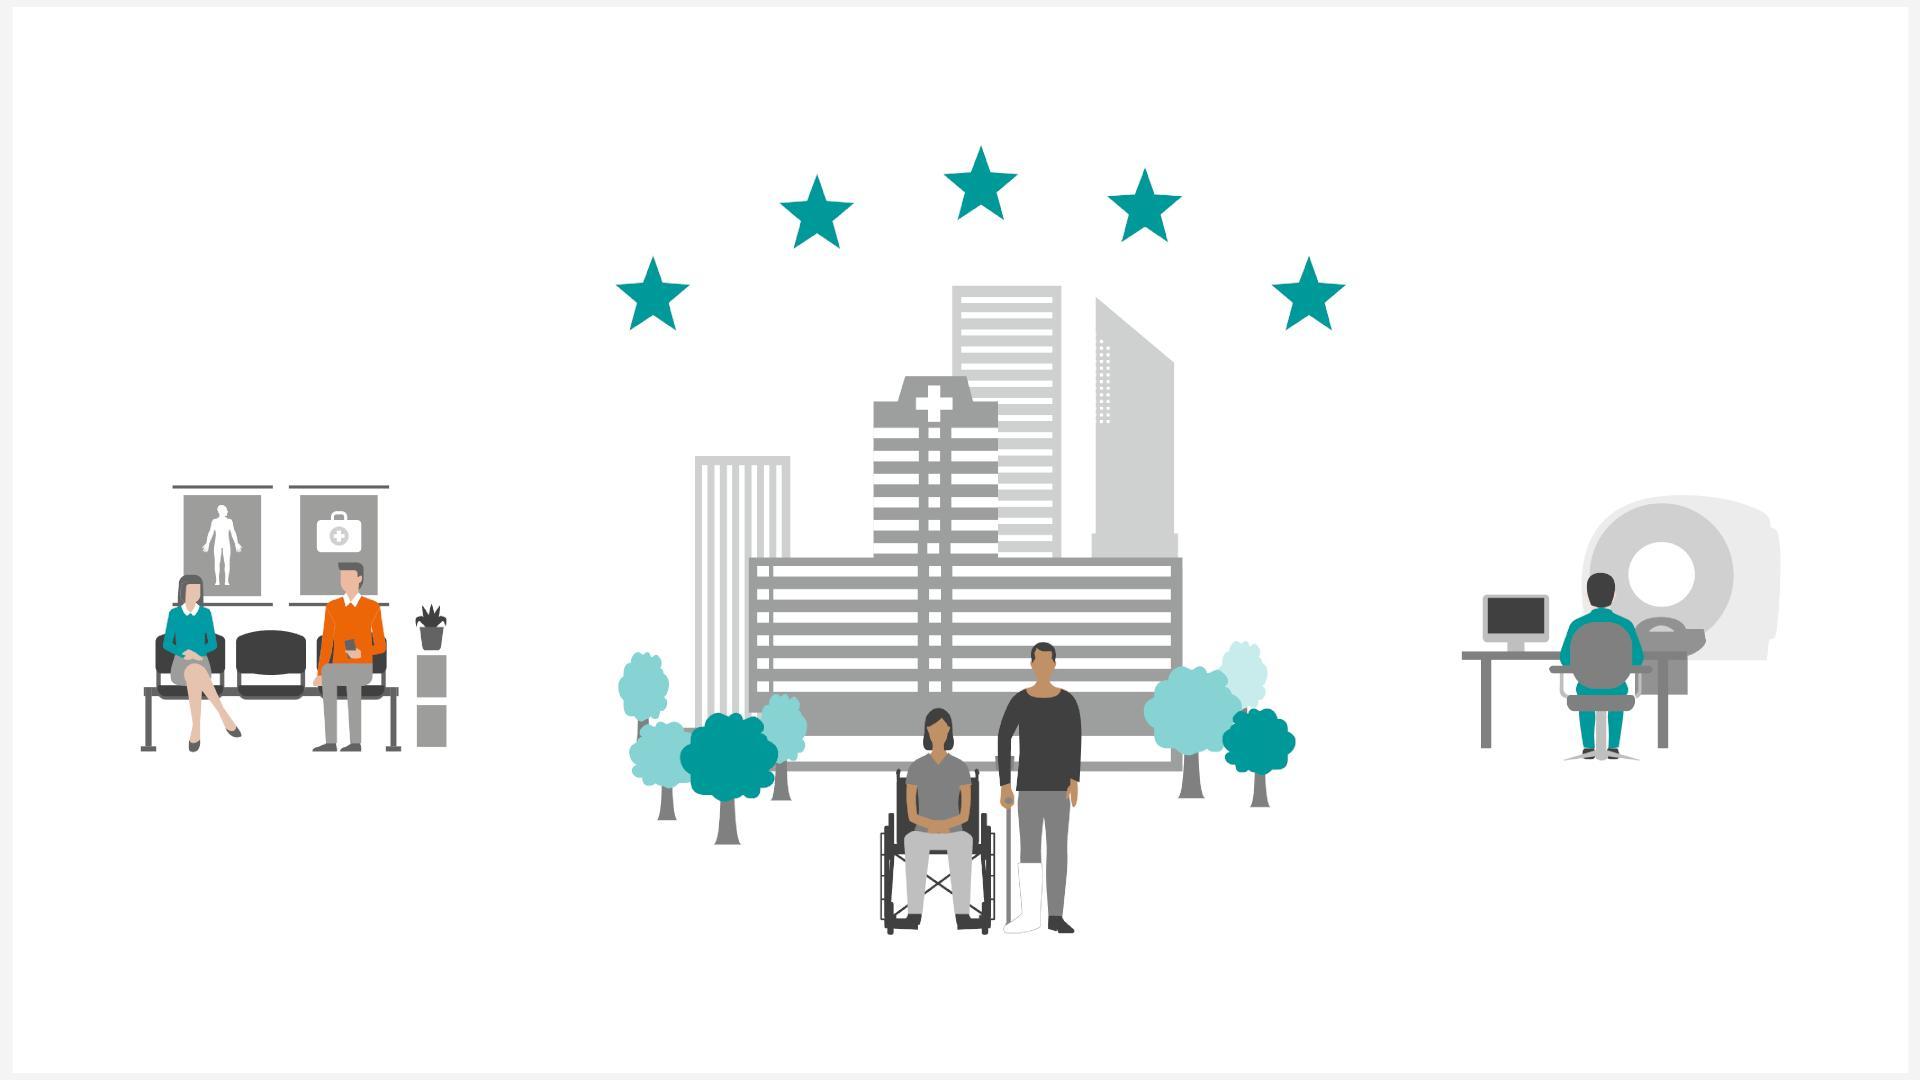 Siemens Healthineers - How to create the healing environment of the future